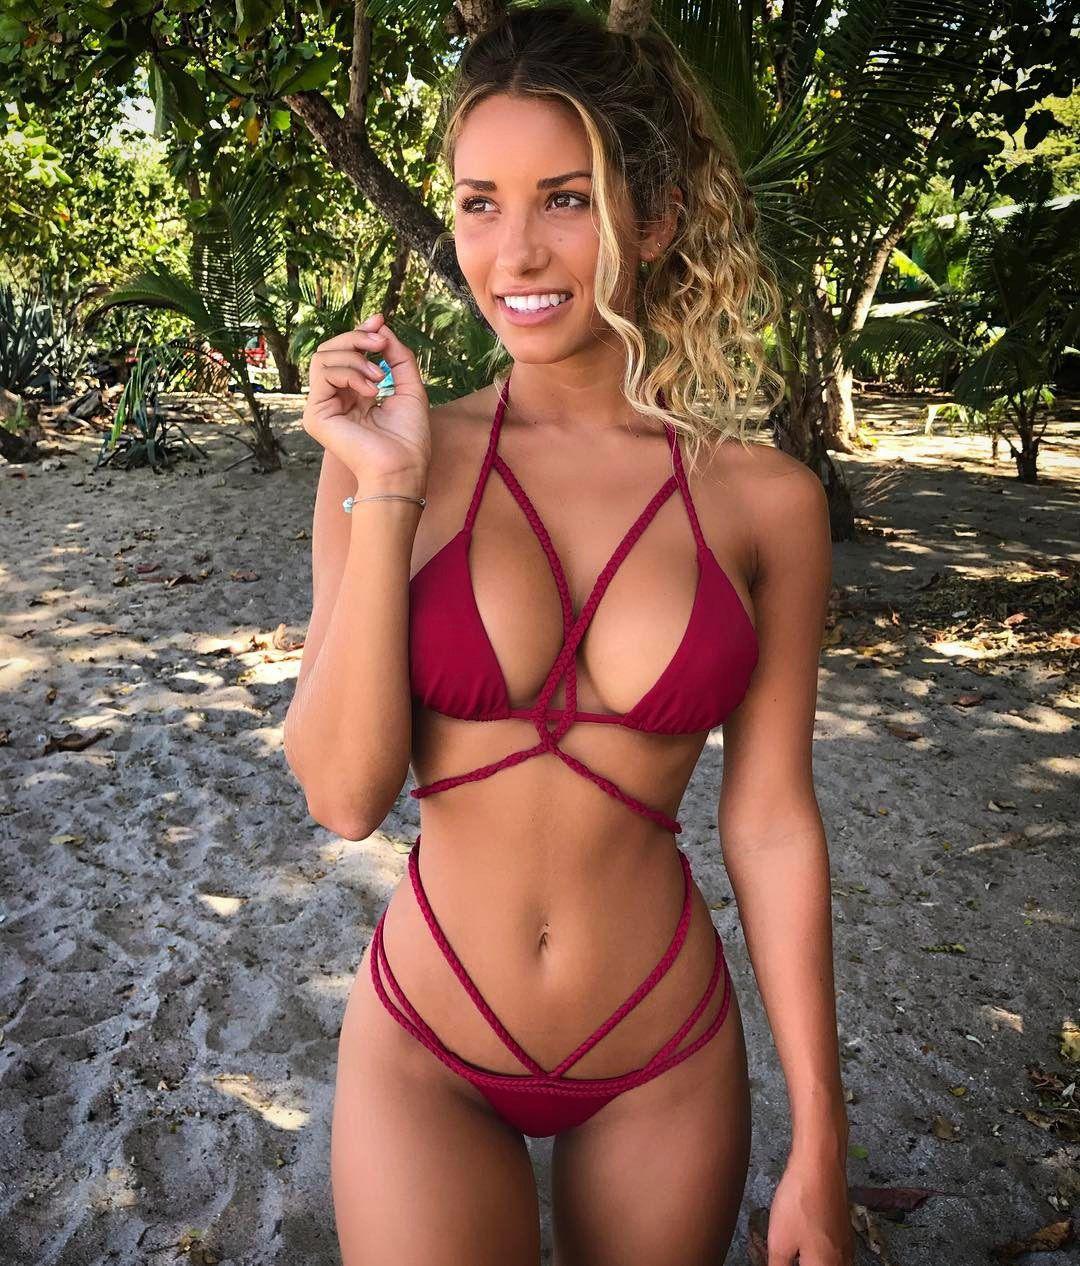 cfb5c5fa14 2019 New Sexy Triangle Push Up Women Swimsuit Bikini Set 2018 Summer  Brazilian Beach Female Swimwear Wwim Sport Wear Bathing Suit Biquini From  ...